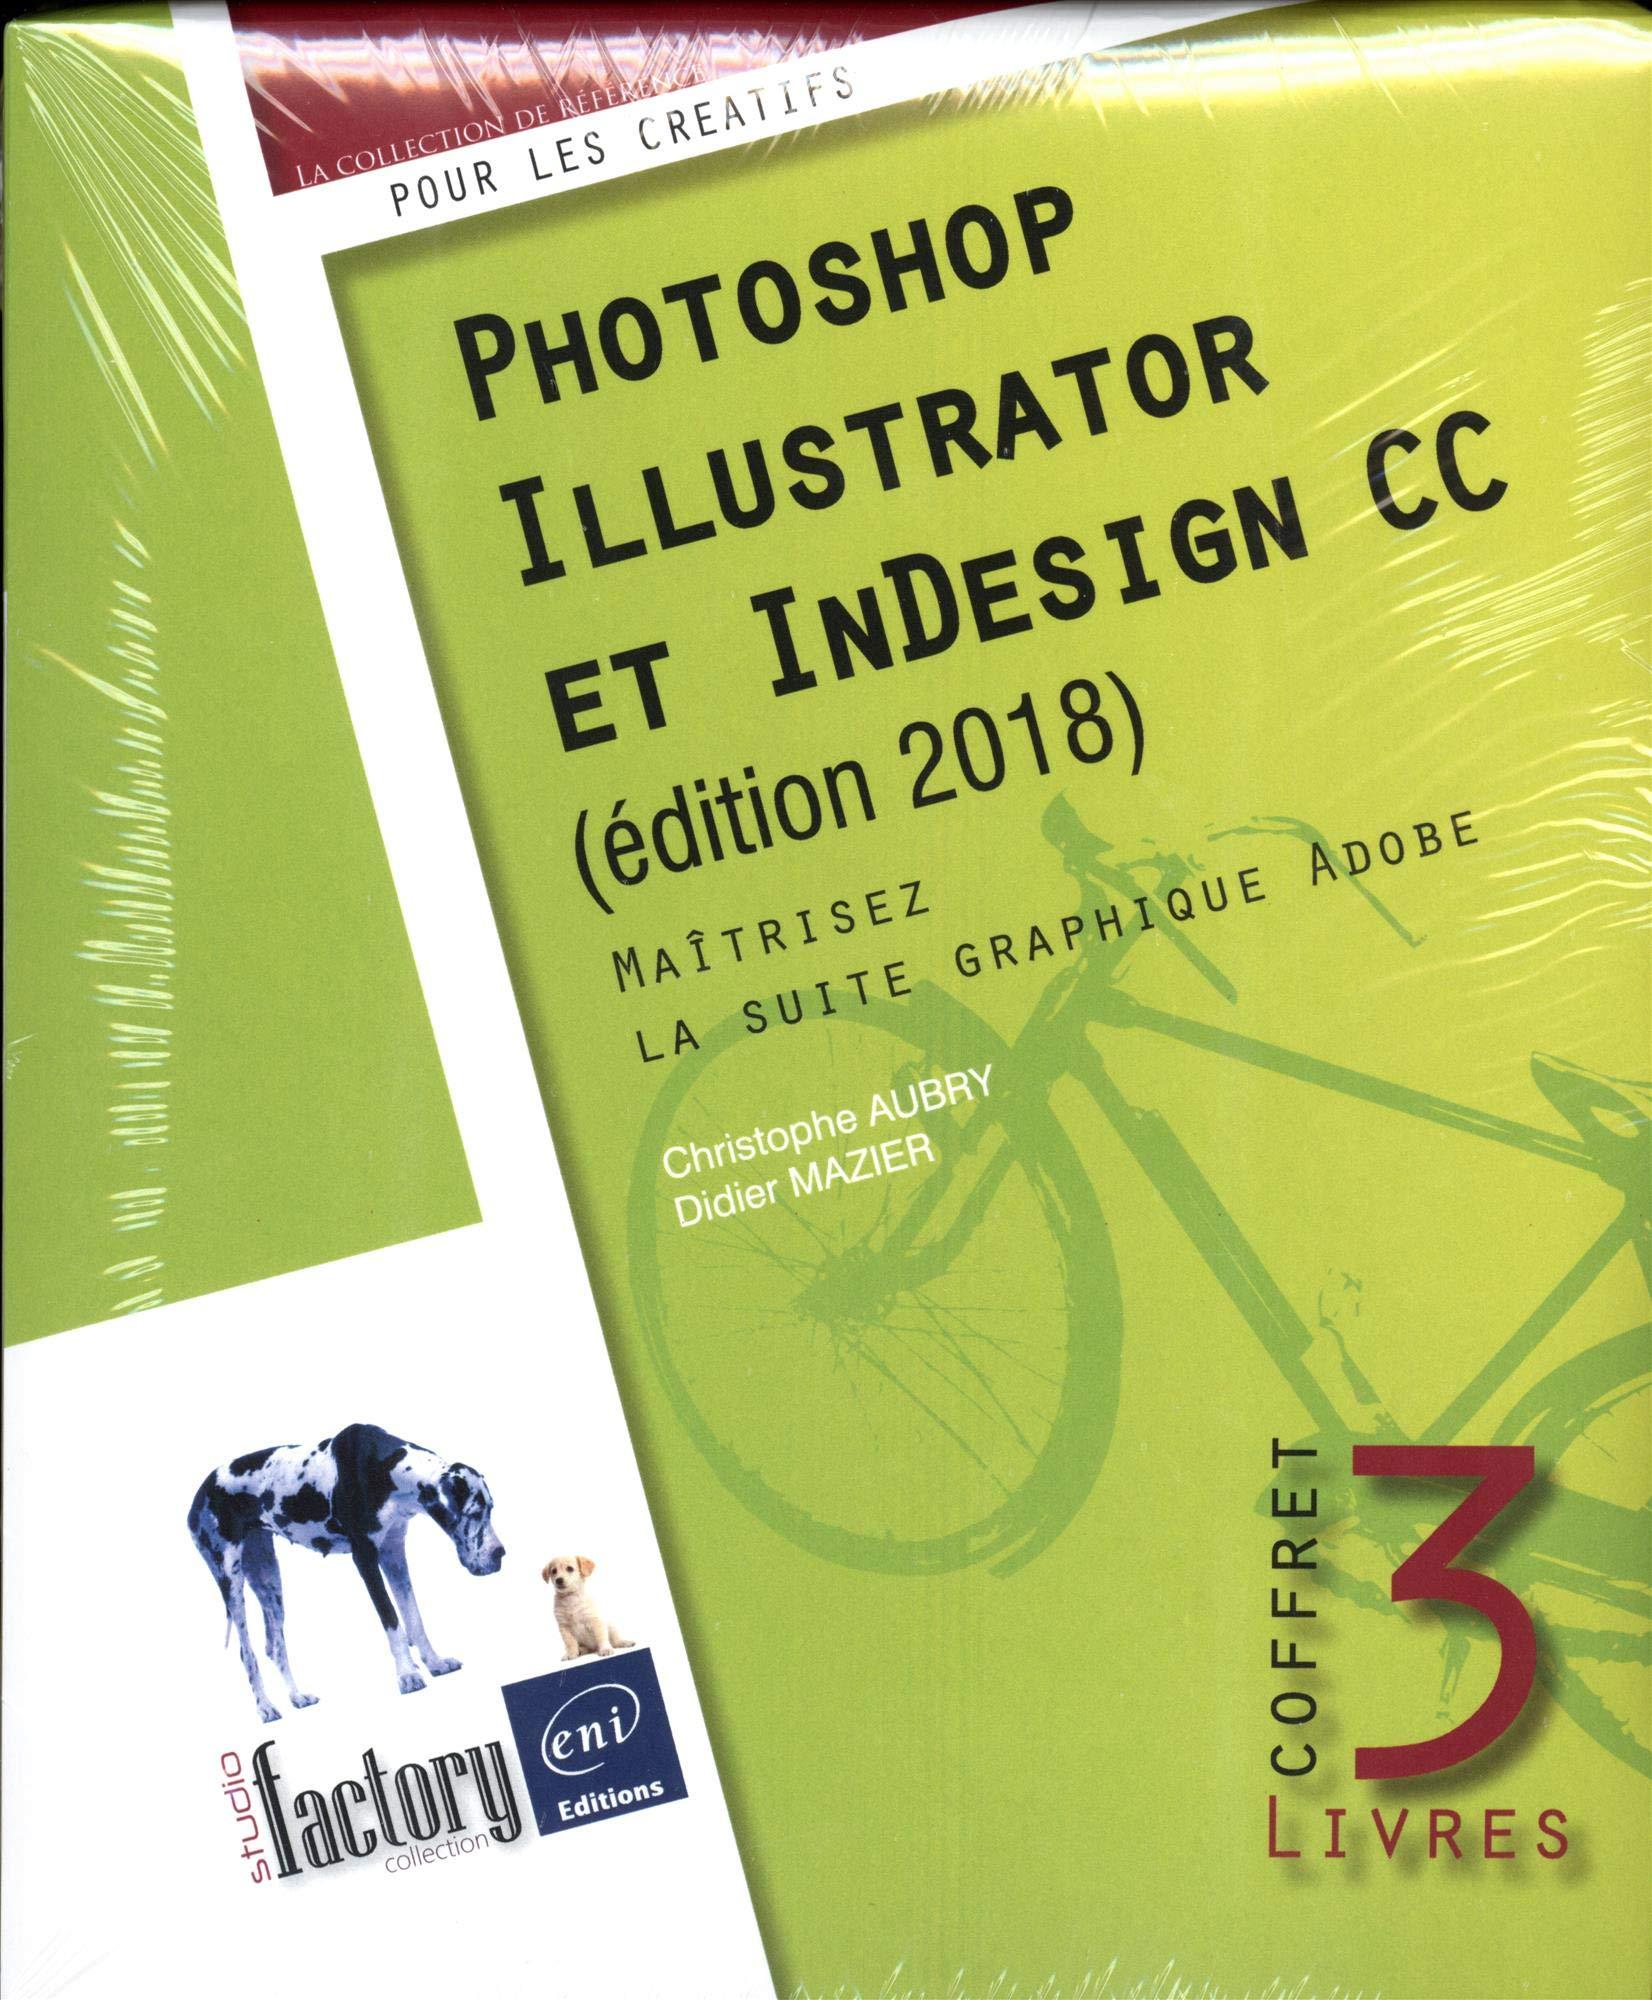 Photoshop Illustrator Et Indesign Cc Coffret En 3 Volumes